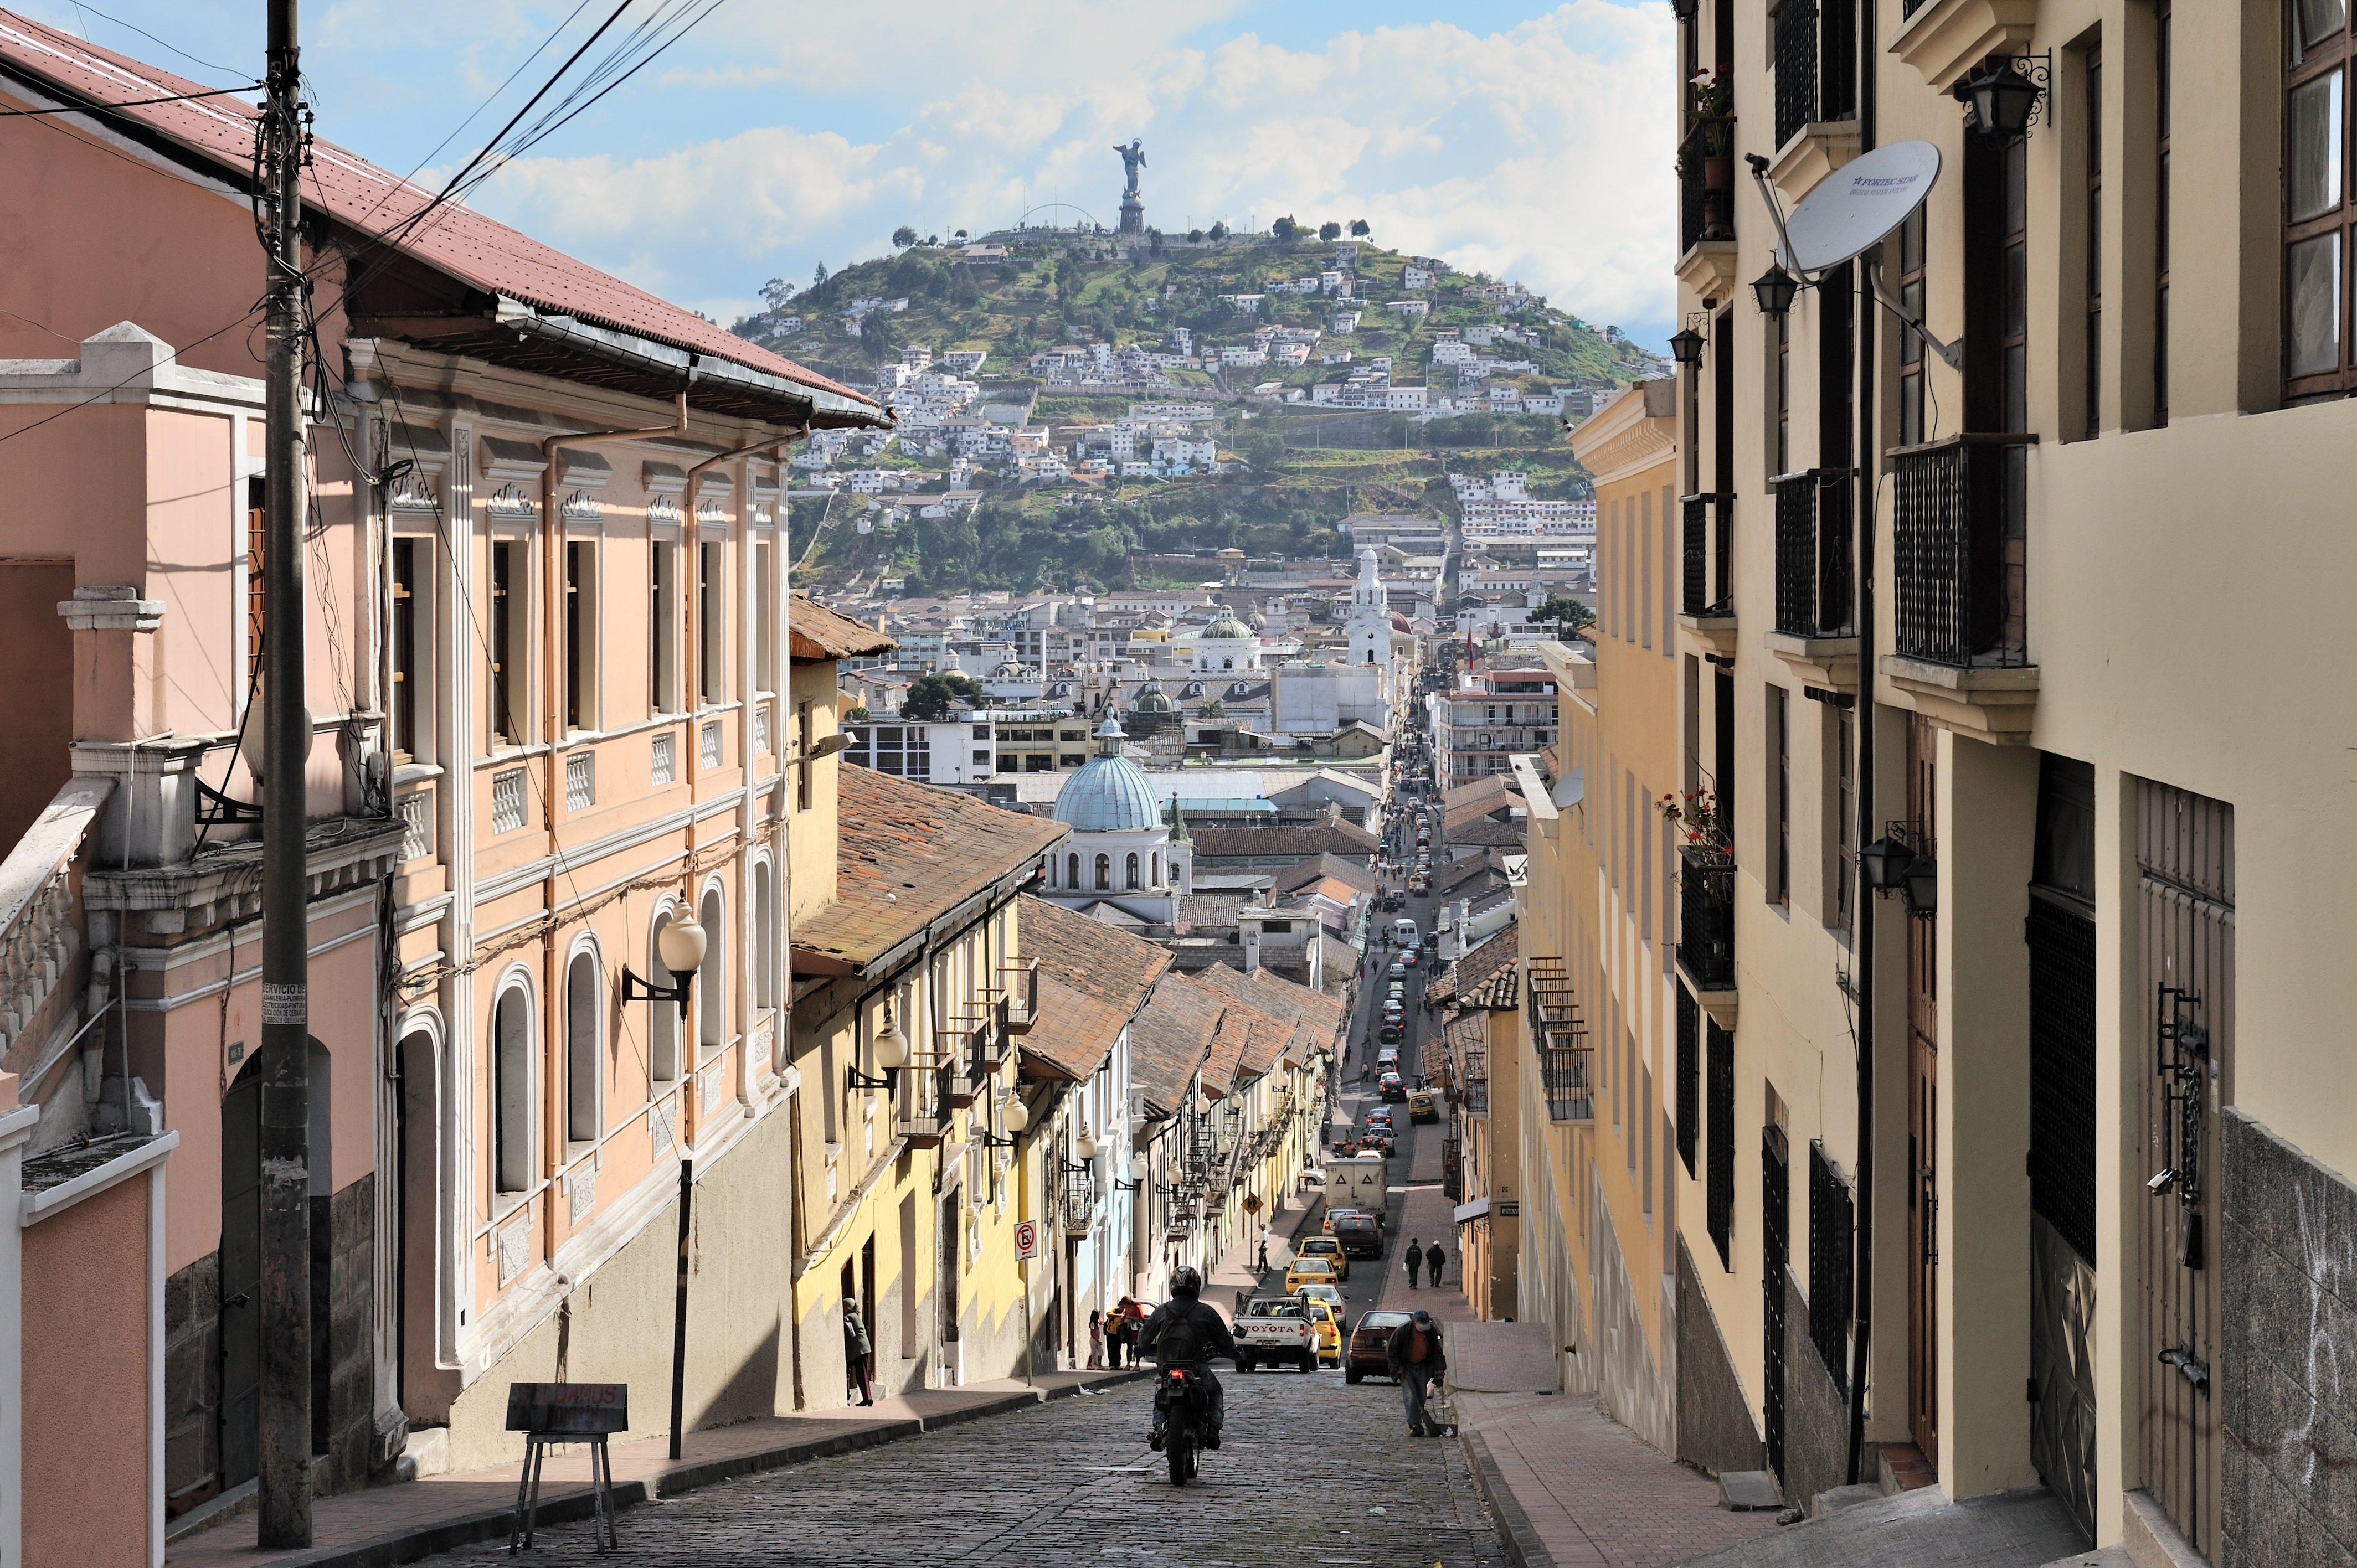 The El Panecillo hill seen from Quito's historic centre along the García Moreno street. Photo: Wikimedia Commons/Cayambe CC-BY-SA 3.0